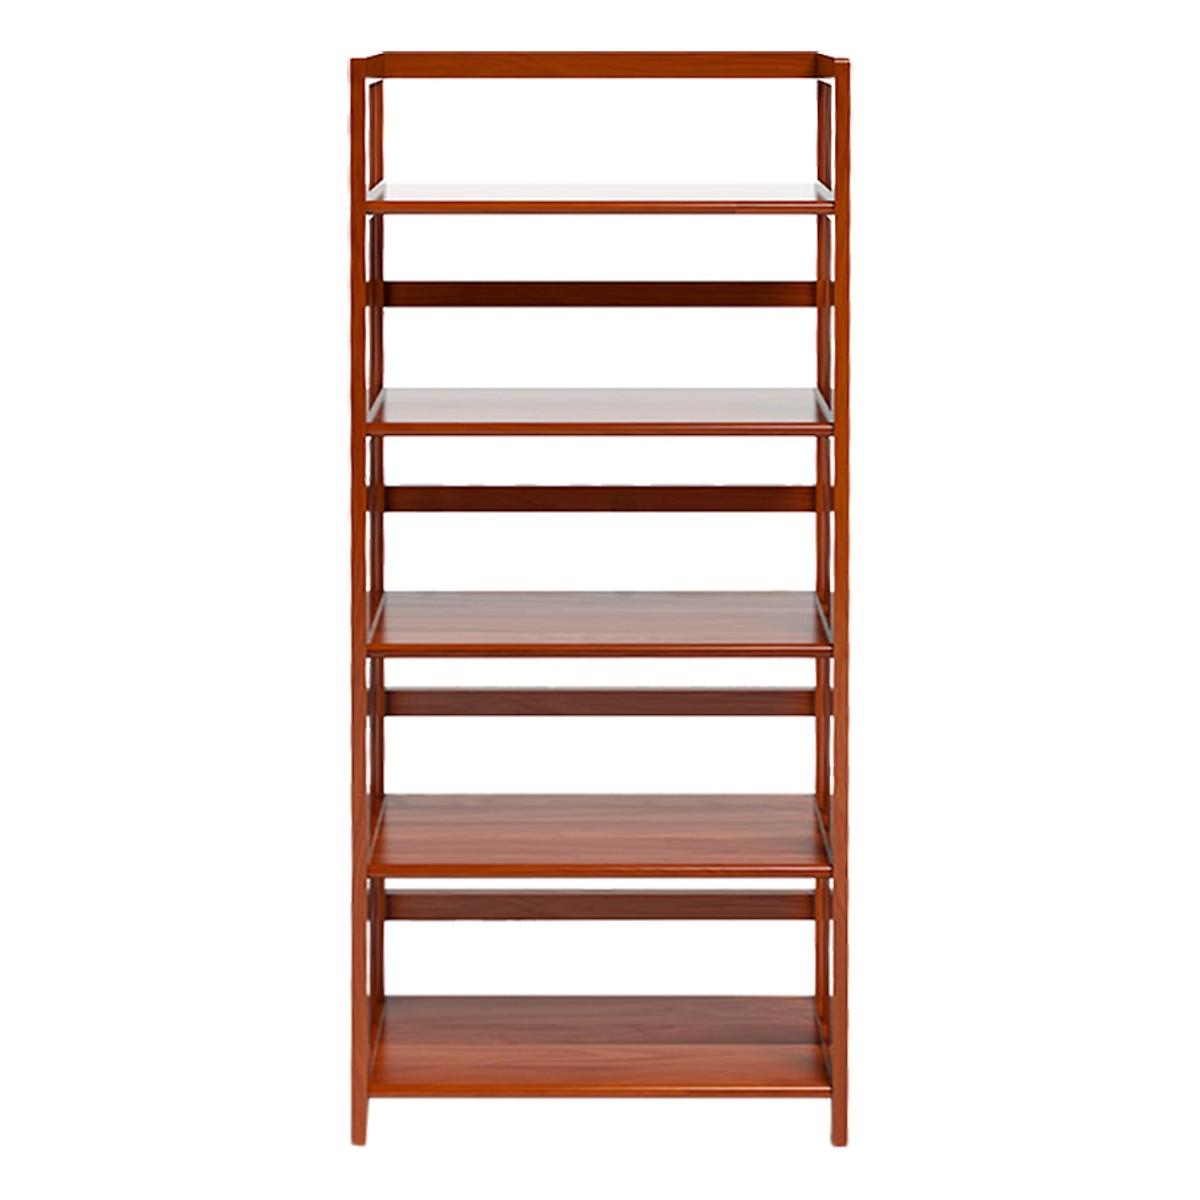 Kệ sách 5 tầng gỗ cao su Ibie KS563 63cm